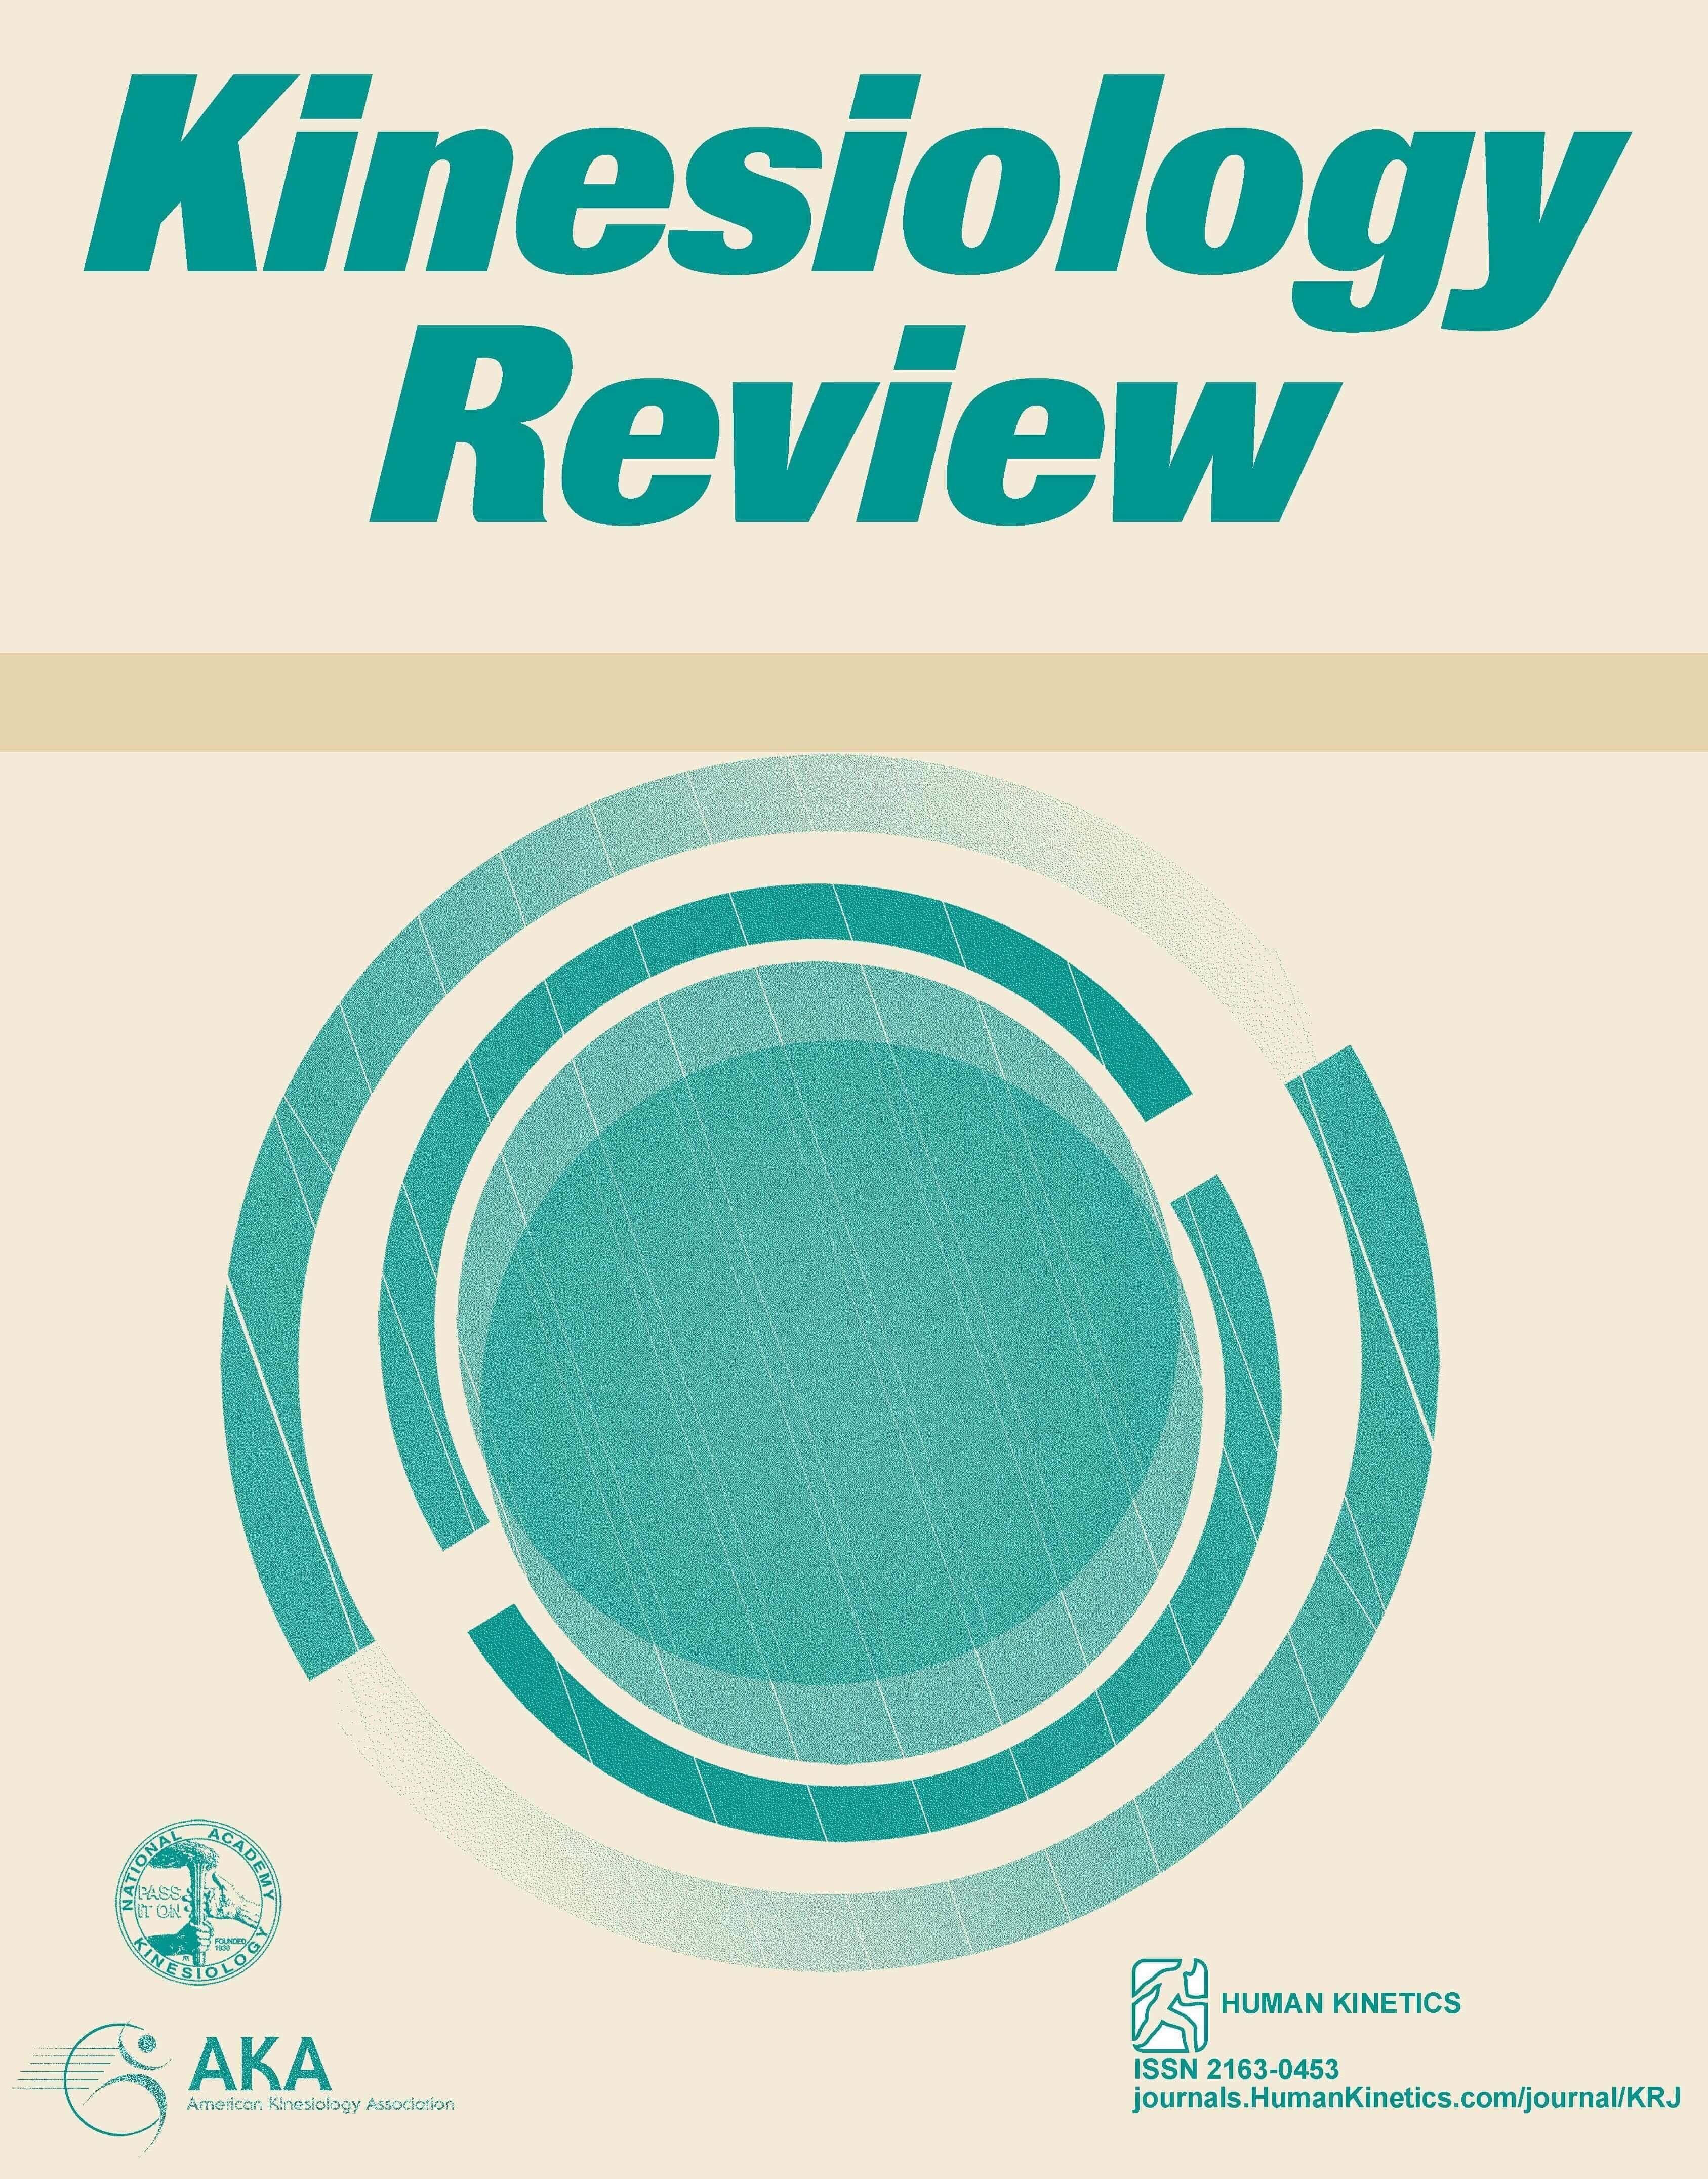 Kinesiology Review Human Kinetics